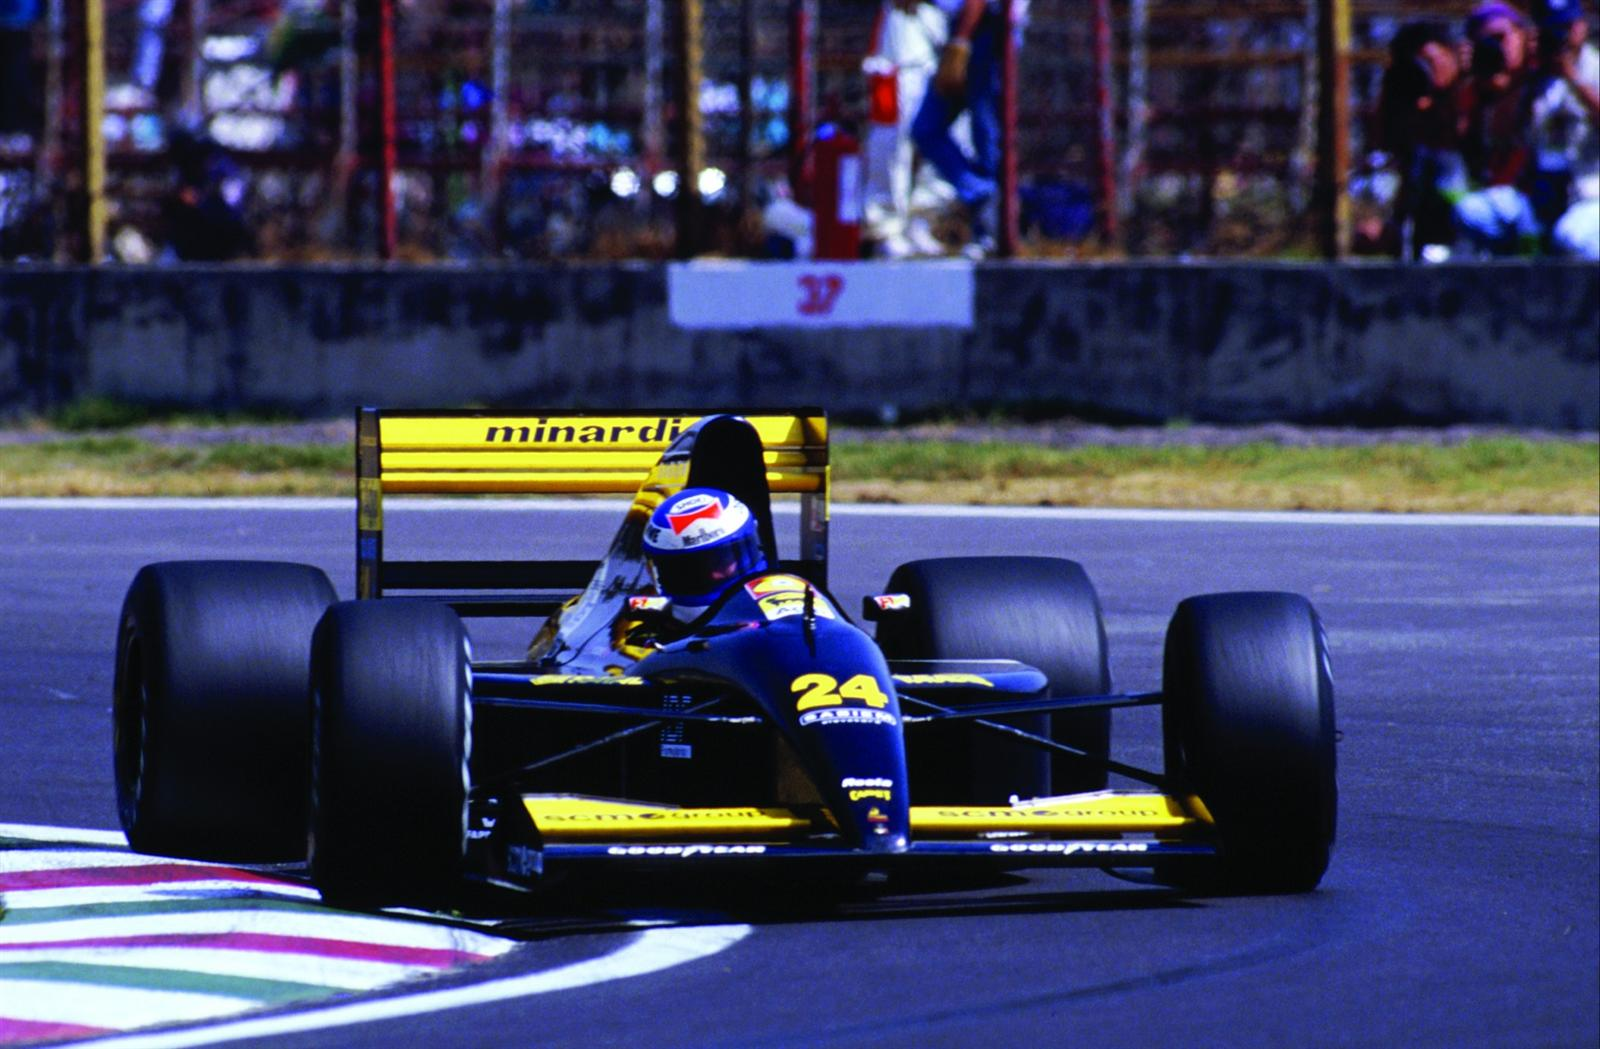 1989 Lamborghini Formula One Image